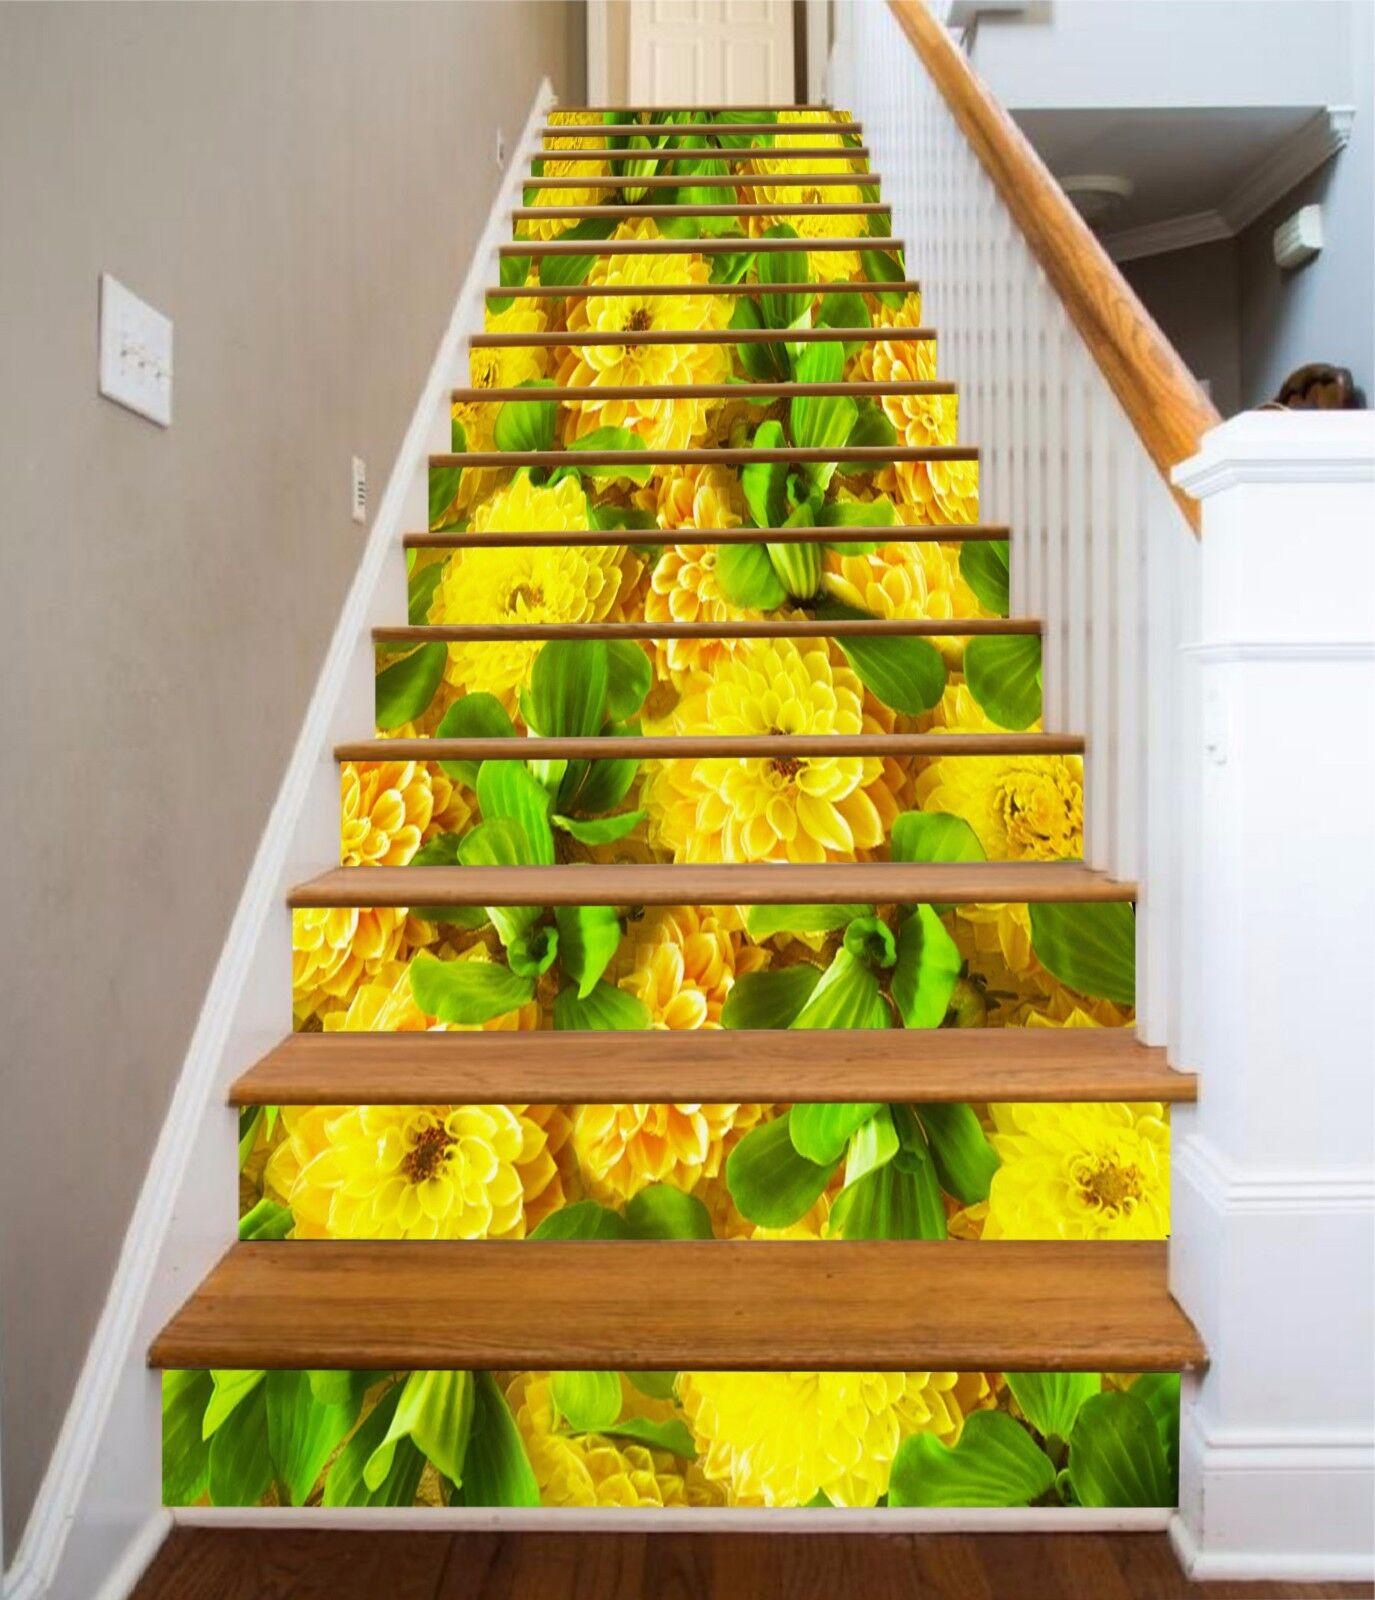 3D Flower Leaf 5017 Stair Risers Decoration Photo Mural Vinyl Decal Wallpaper AU